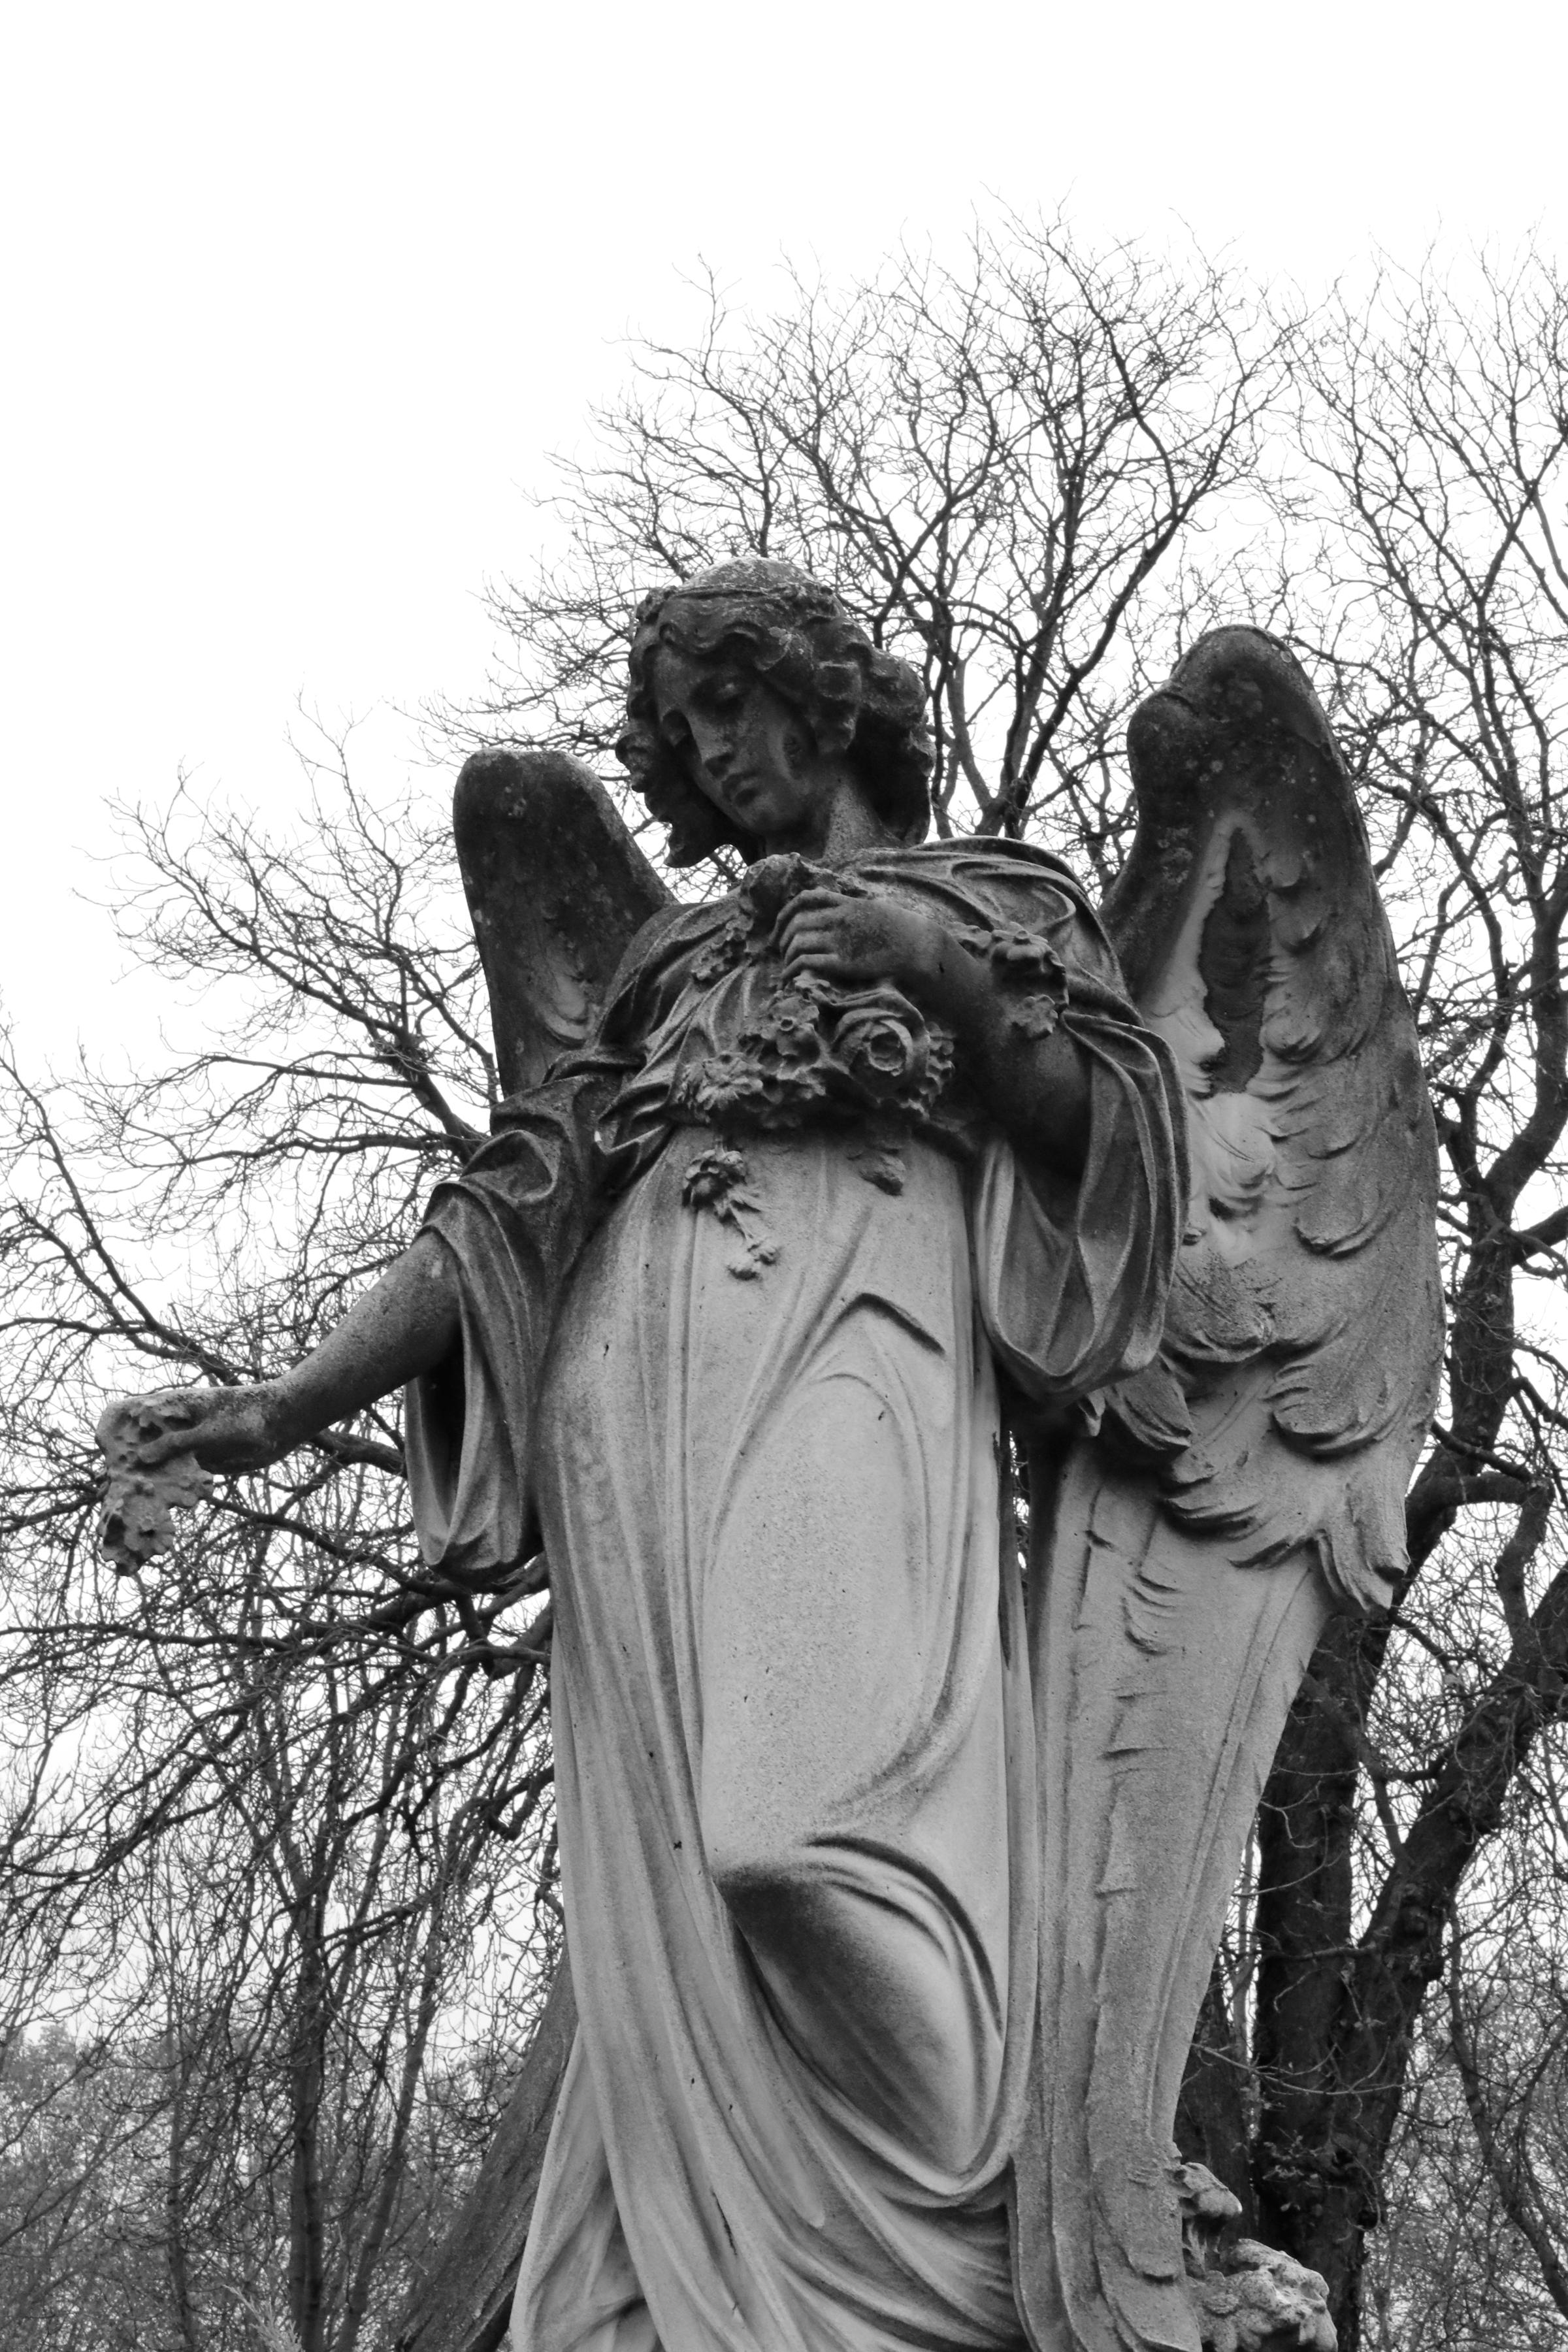 Angel statue on grave, Paris France   https://www.ebay.com/itm/263679741934?ssPageName=STRK:MESELX:IT&_trksid=p3984.m1555.l2649